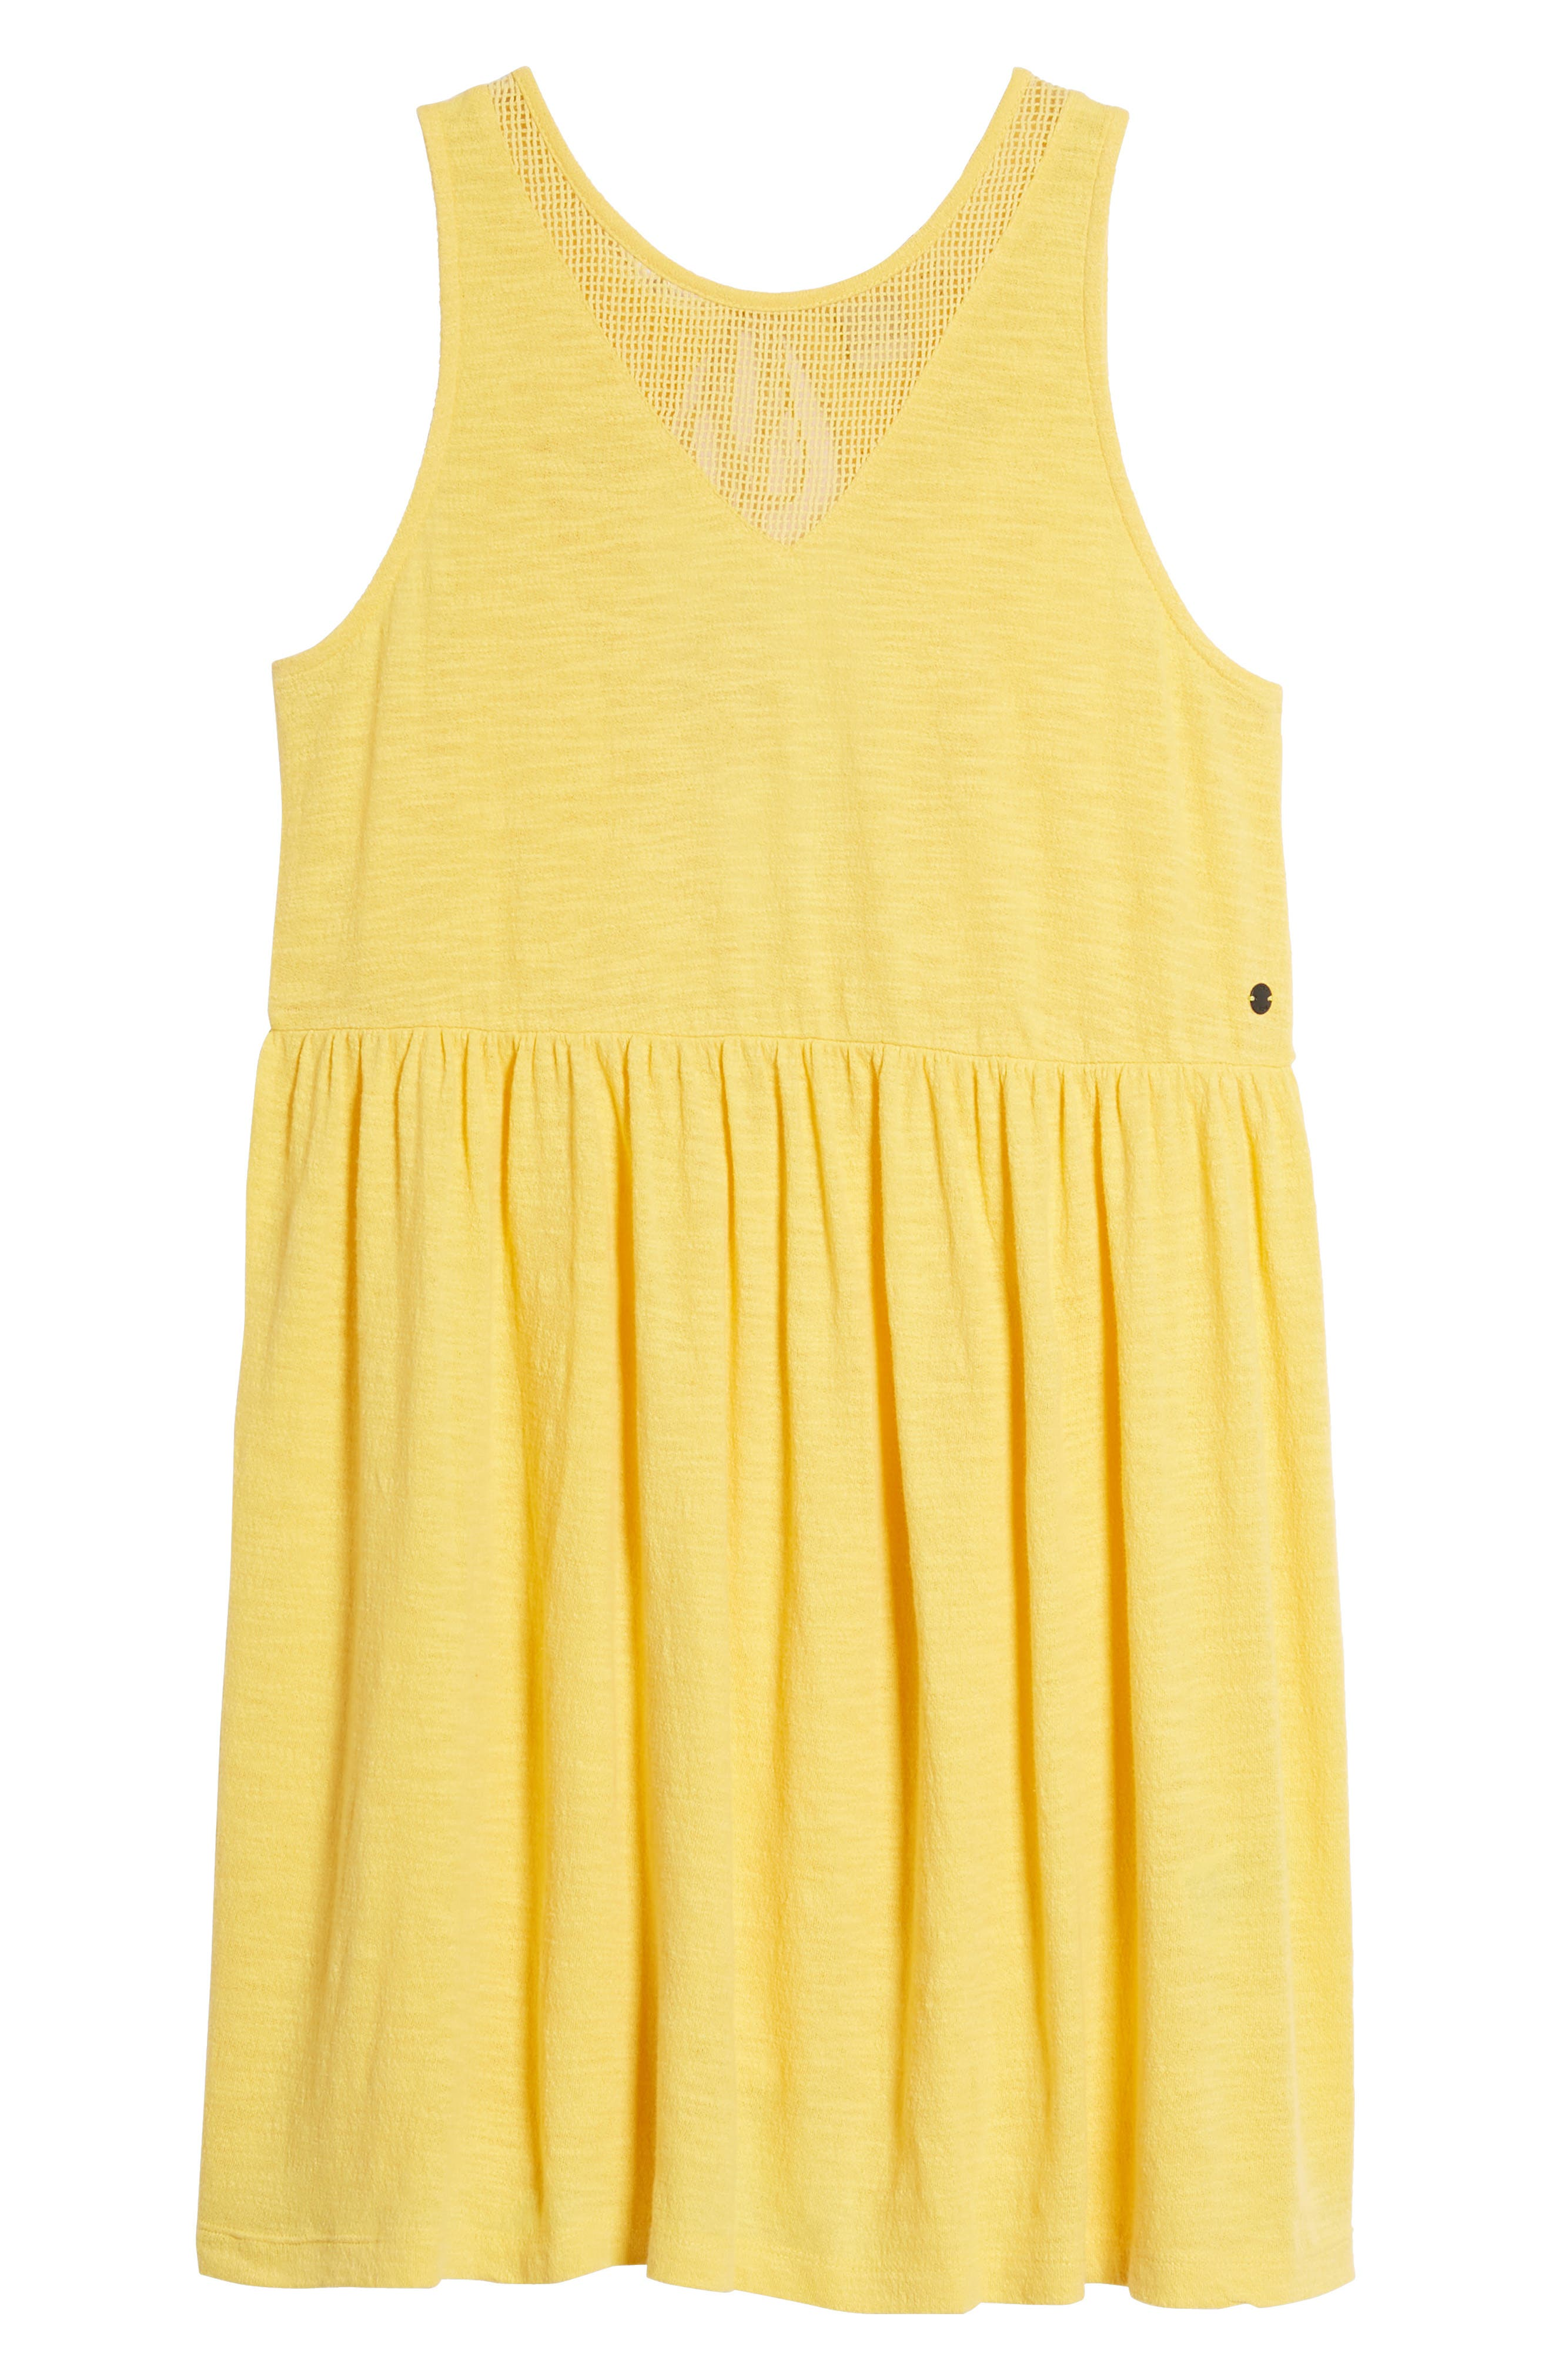 Tucson Cotton Dress,                             Alternate thumbnail 7, color,                             Buff Yellow